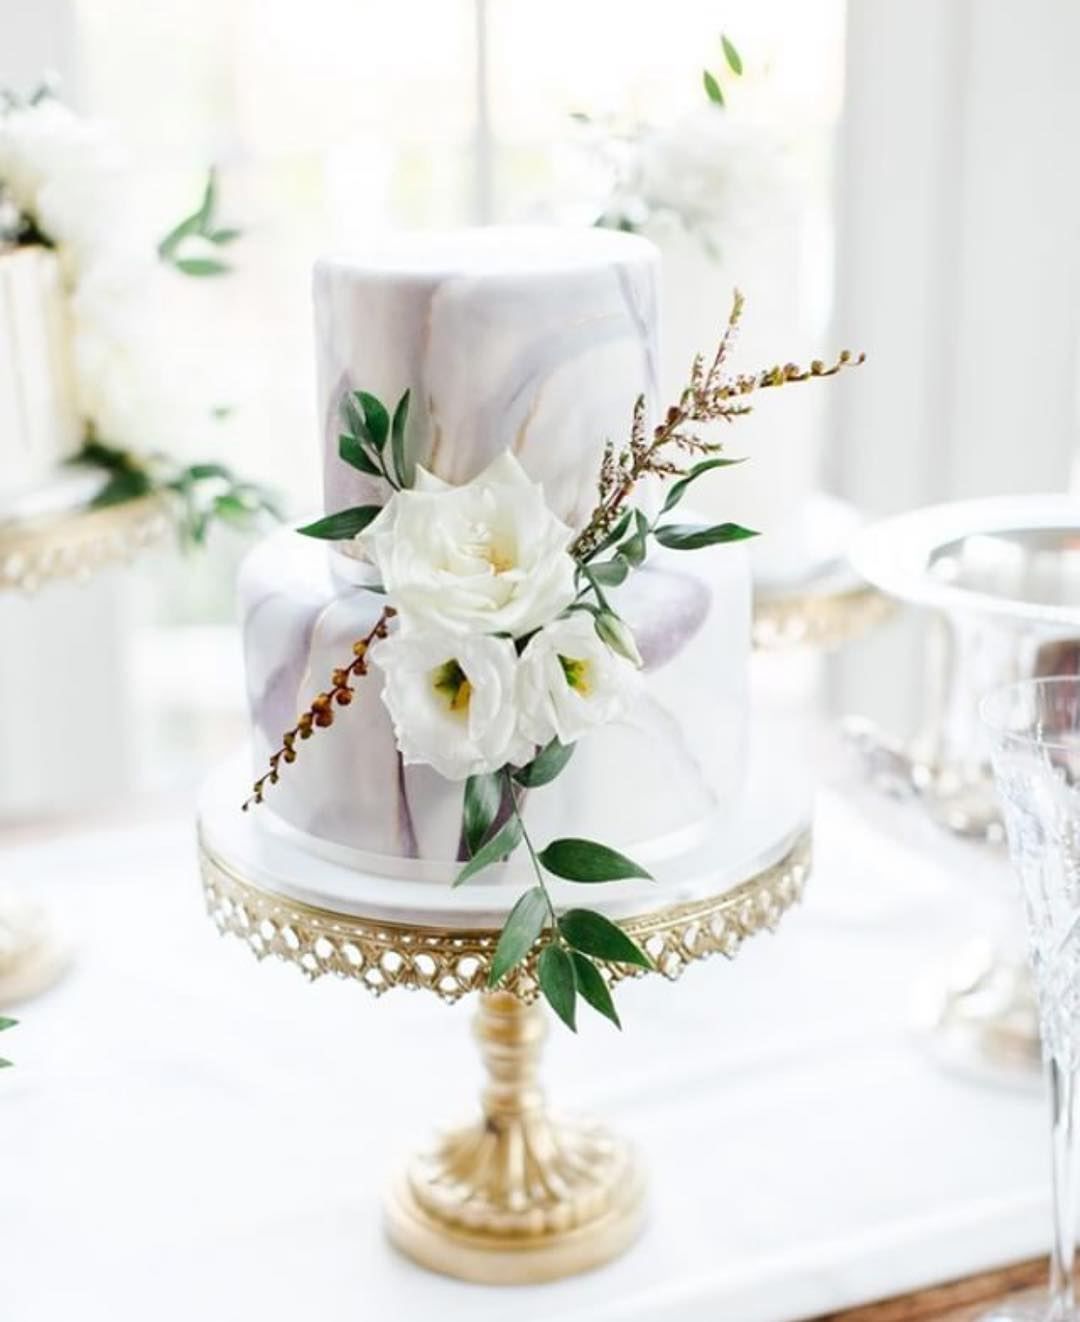 marble wedding cake by cake envy ga opulent treasures cake stand.jpg